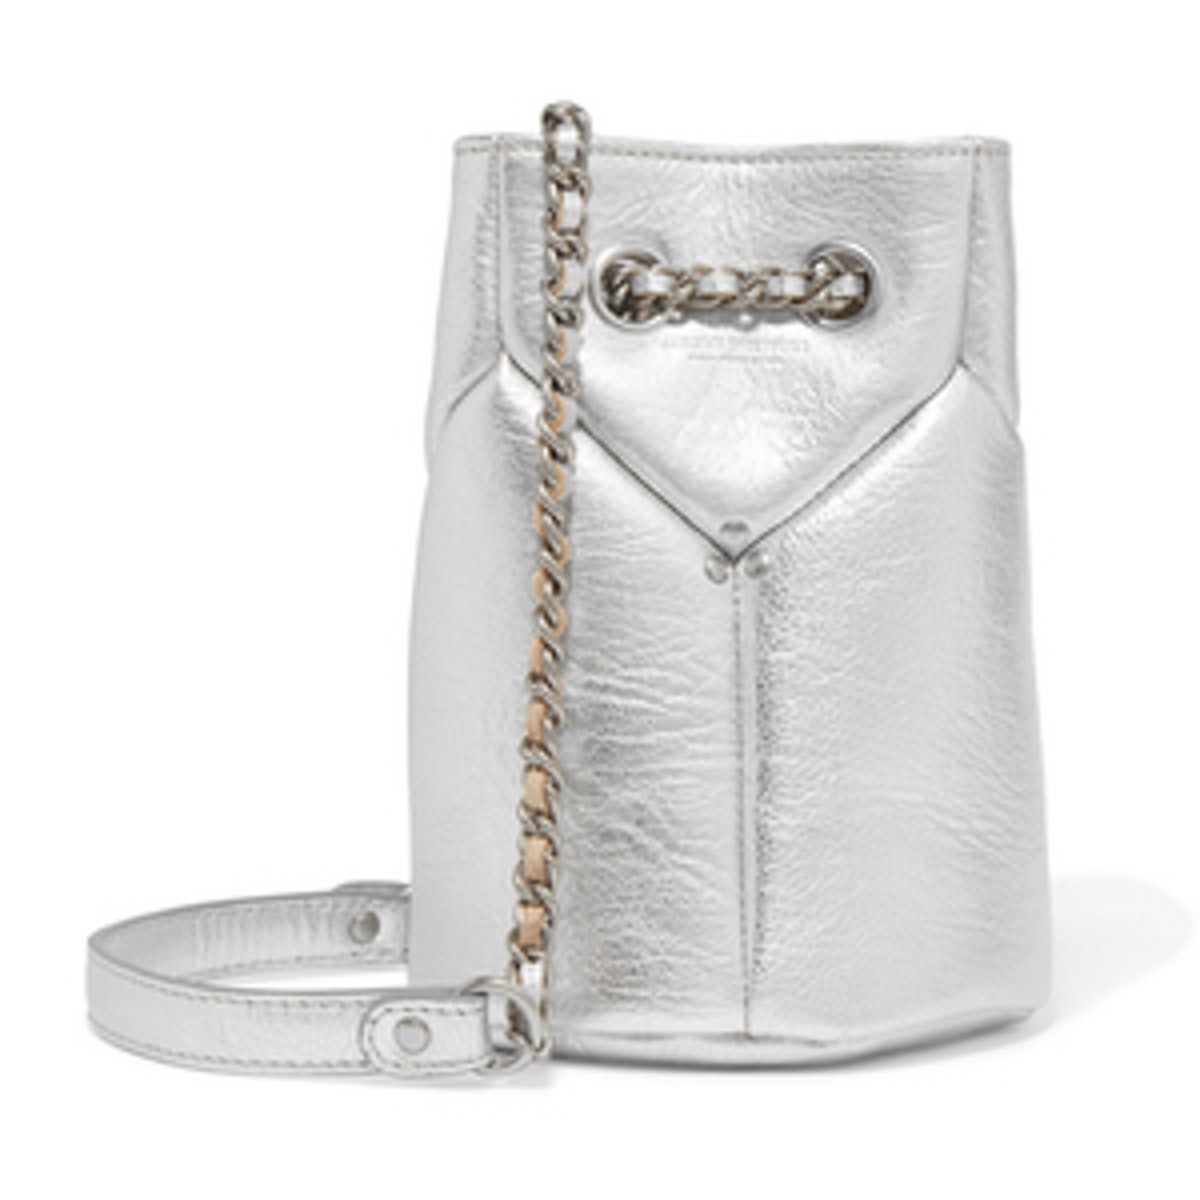 Popeye Mini Metallic Textured-Leather Bucket Bag